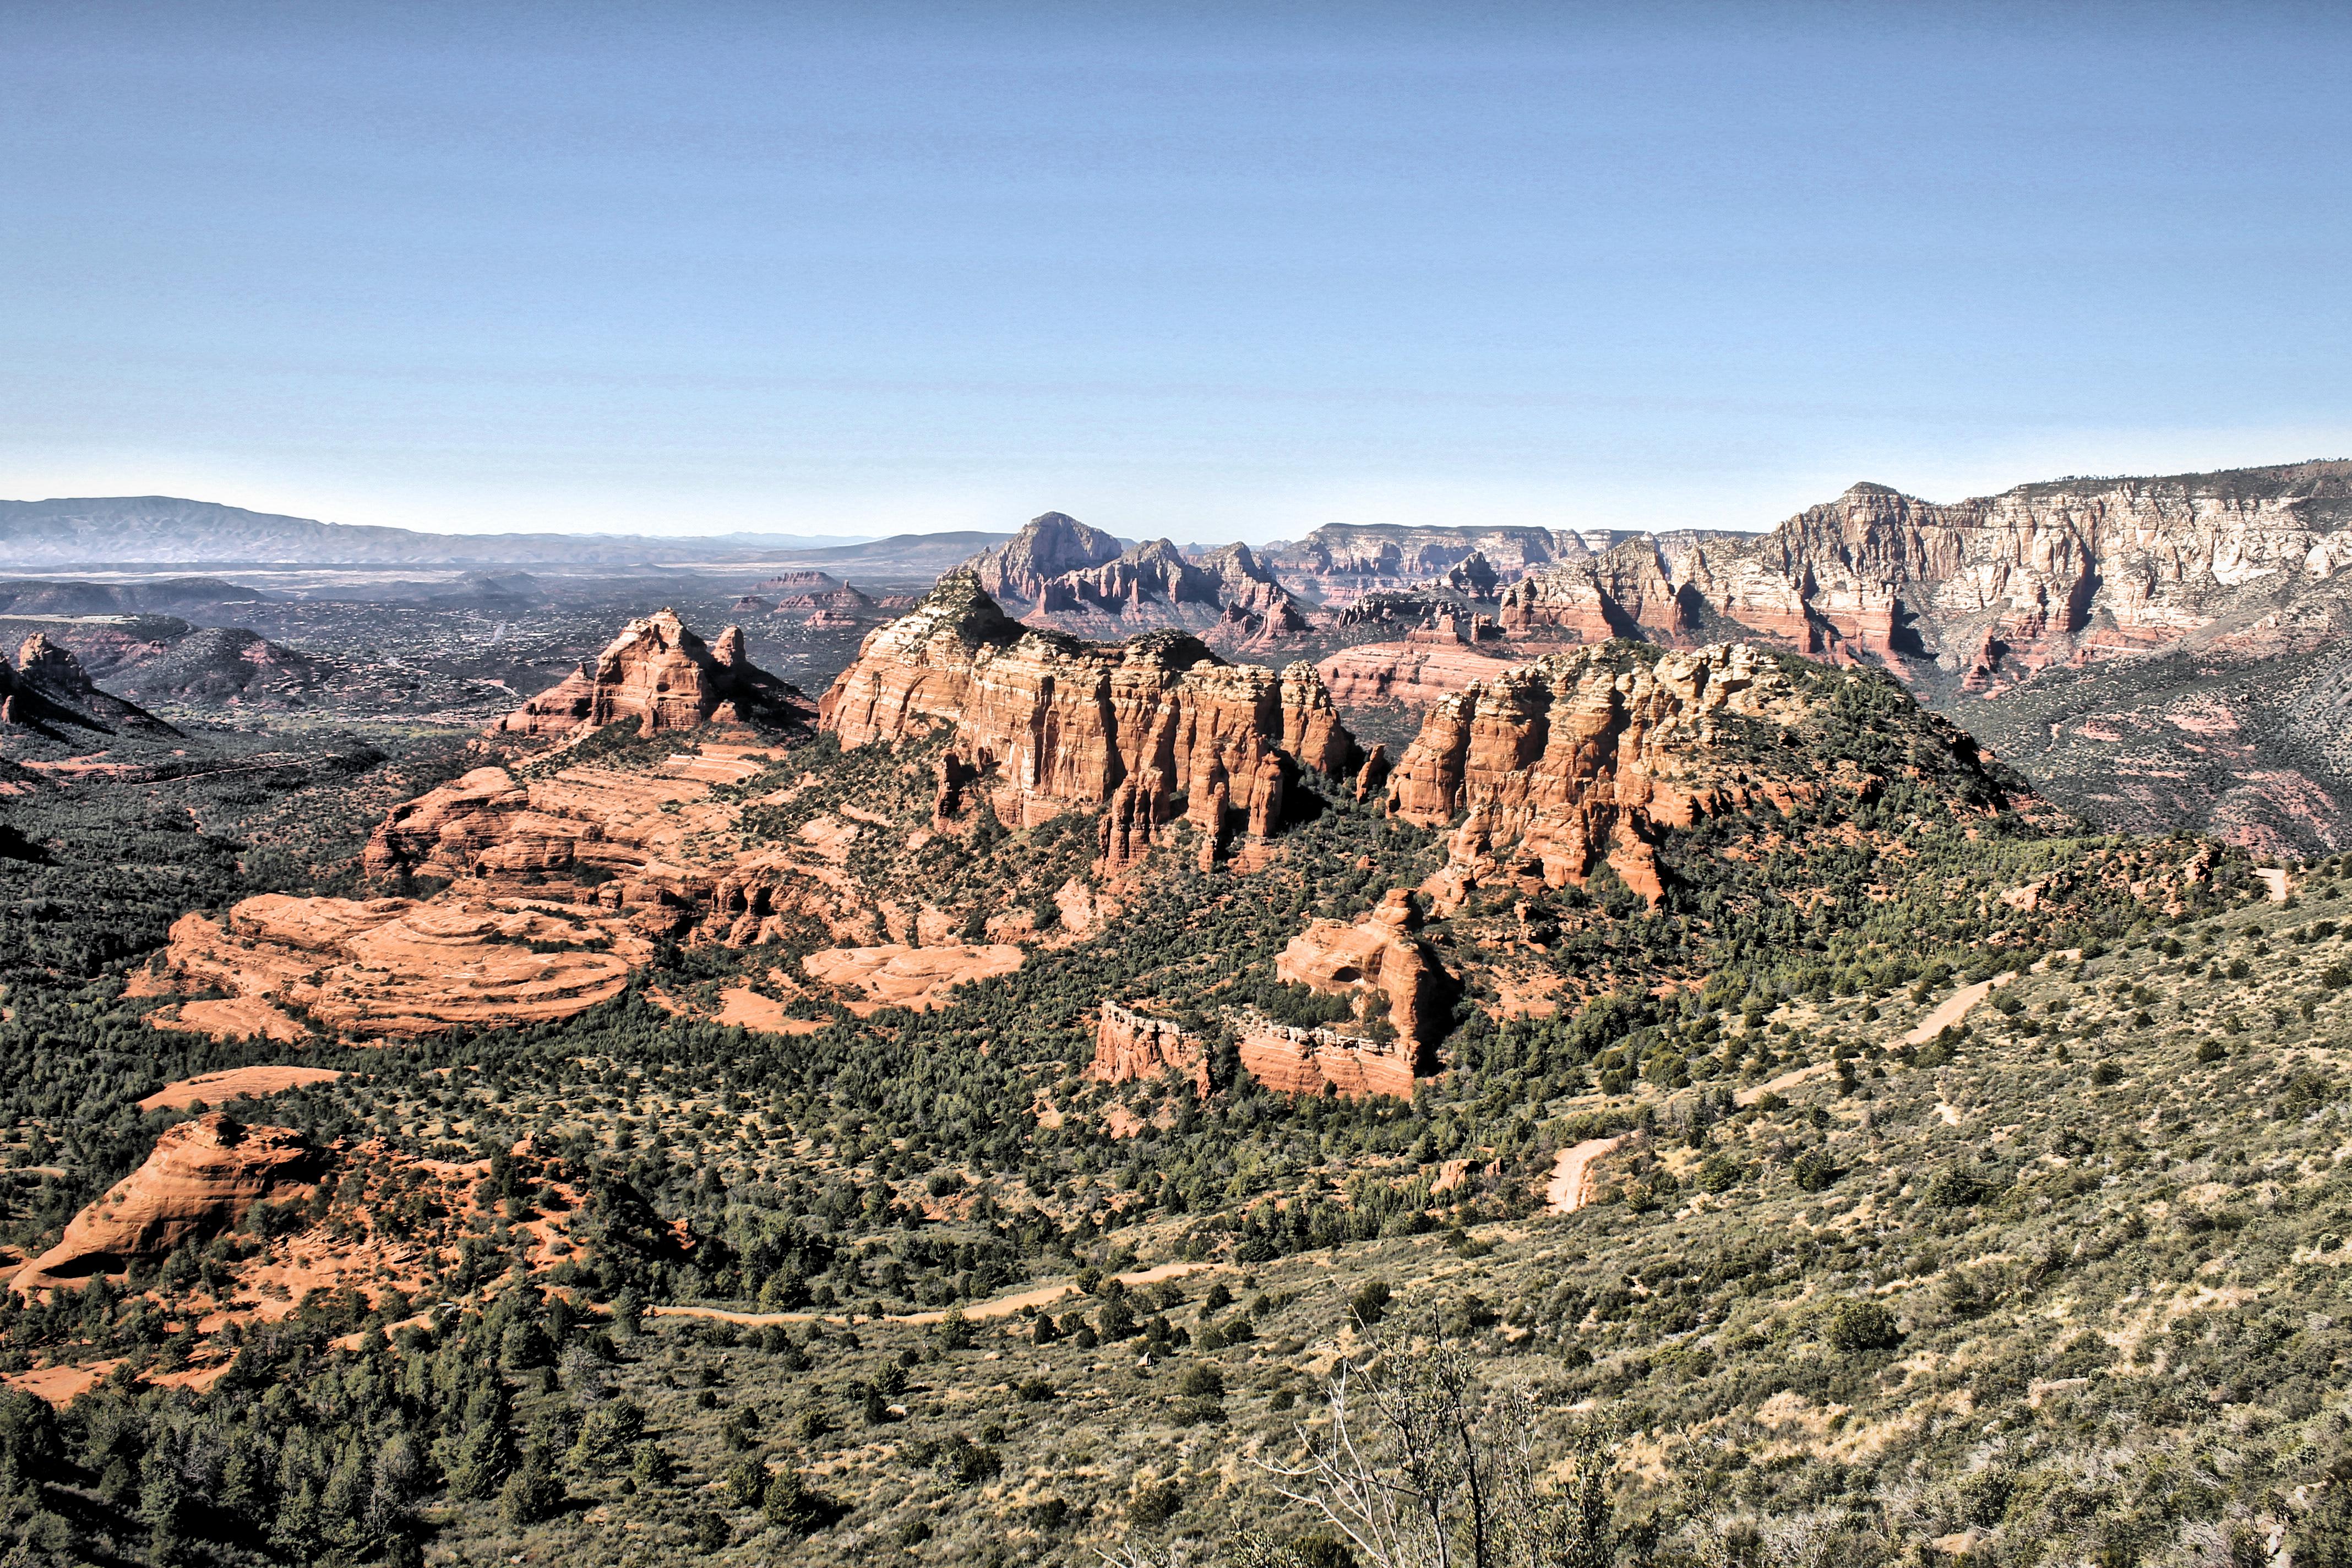 Sedona, Arizona: Not Just Another Moab